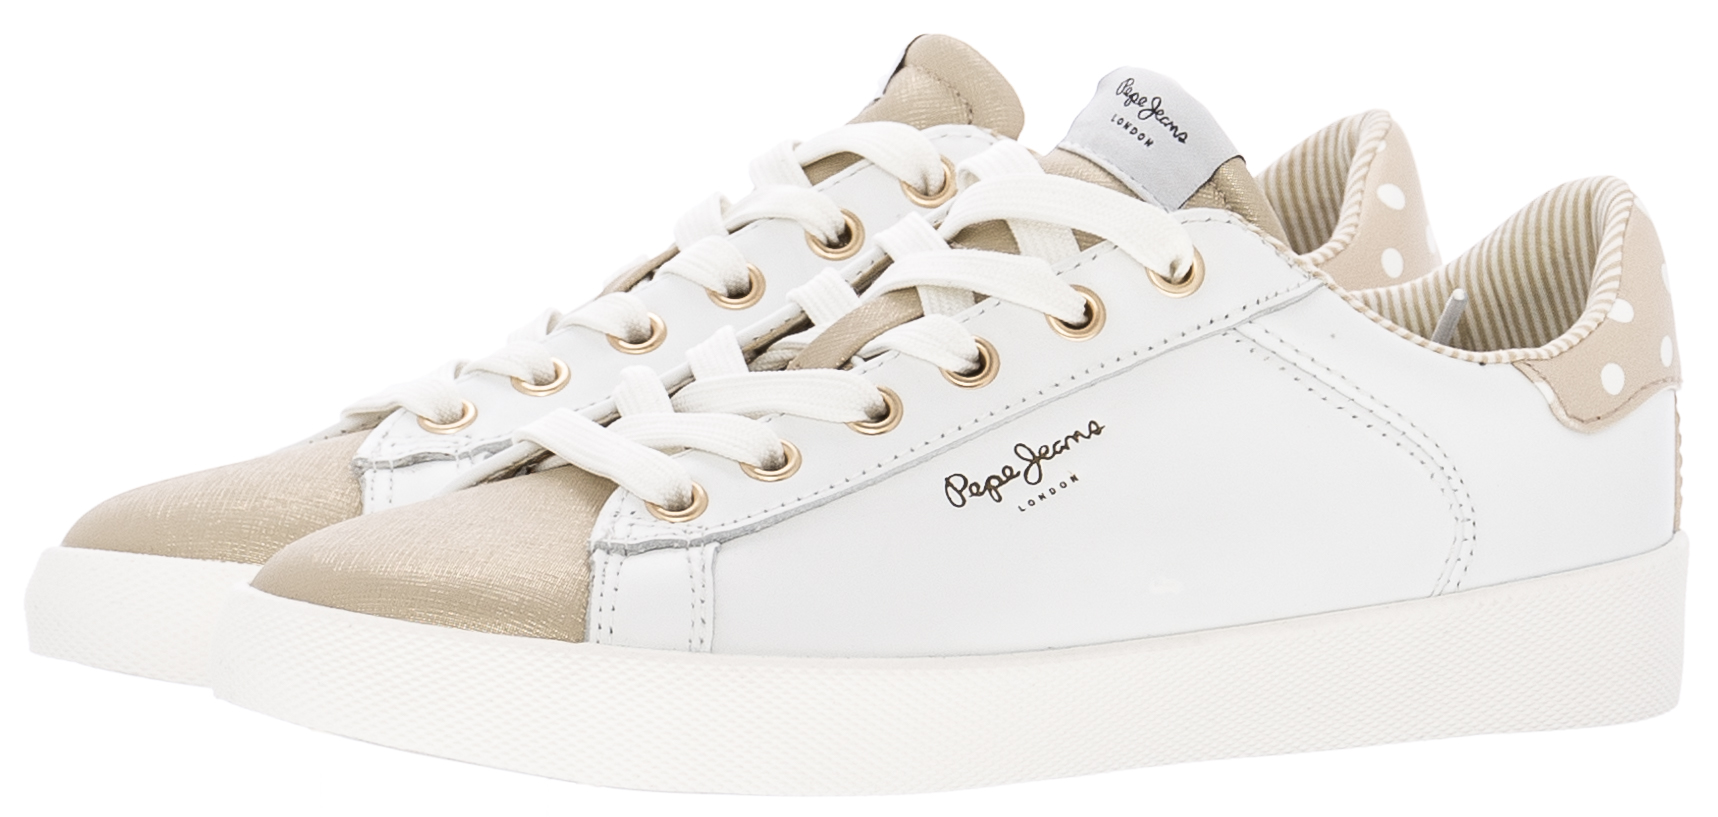 Pepe Jeans Γυναικεία Παπούτσια Casual Kioto.Dotty Χρυσό ECOleather ... eaa443106ef